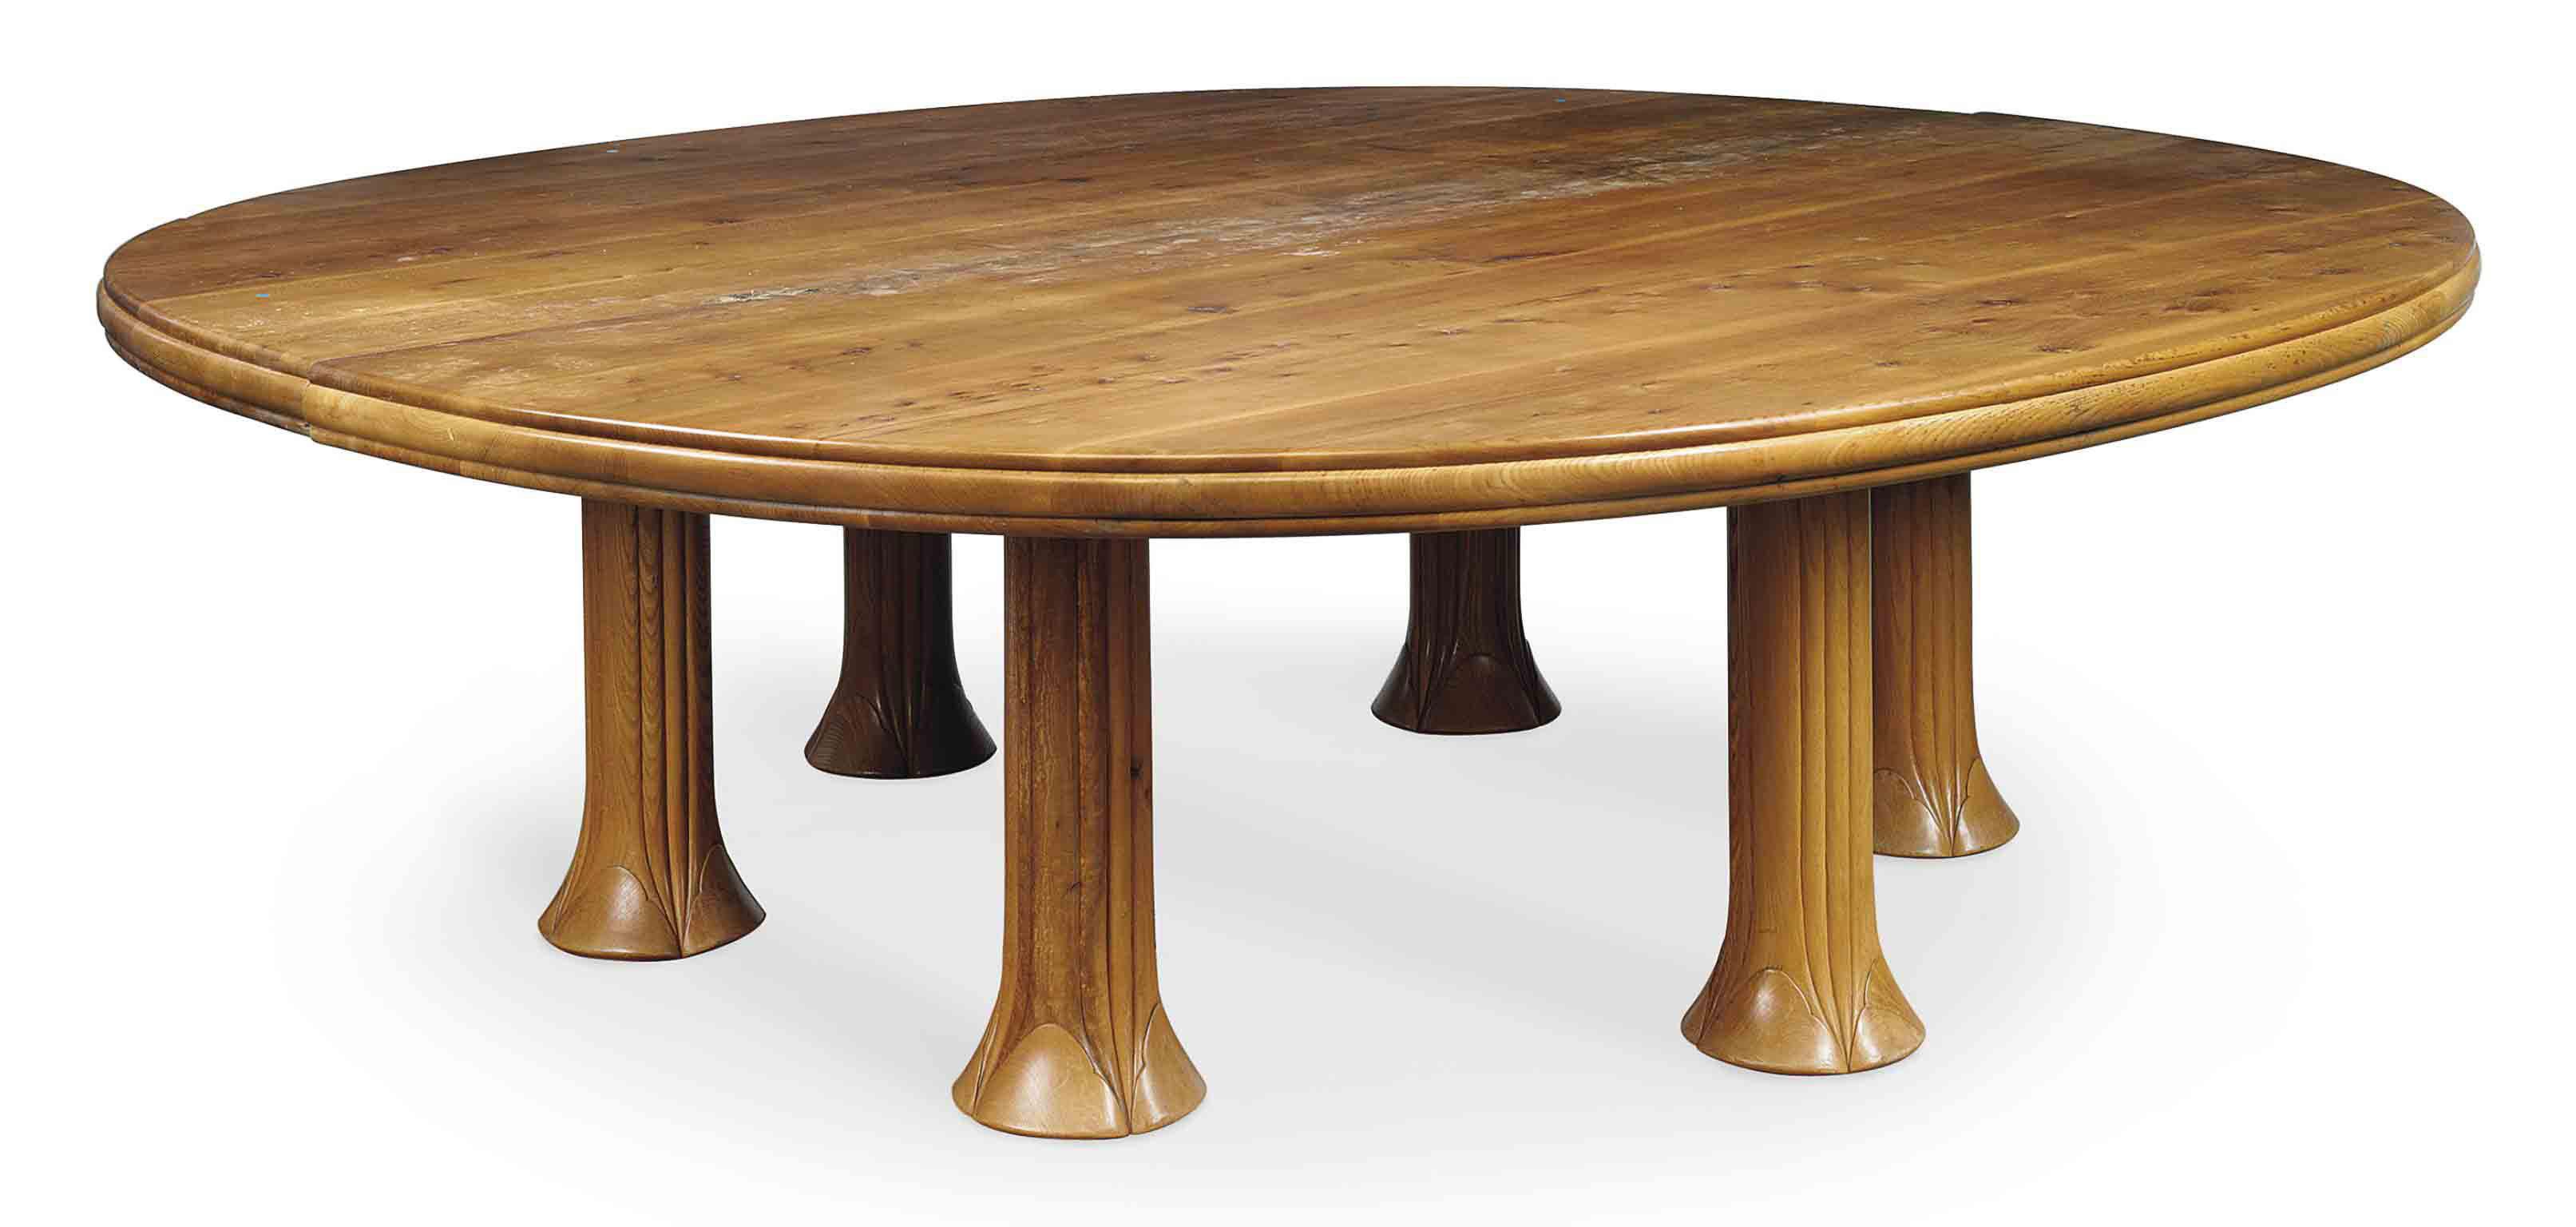 A JOHN MAKEPEACE ENGLISH ELM DINING TABLE